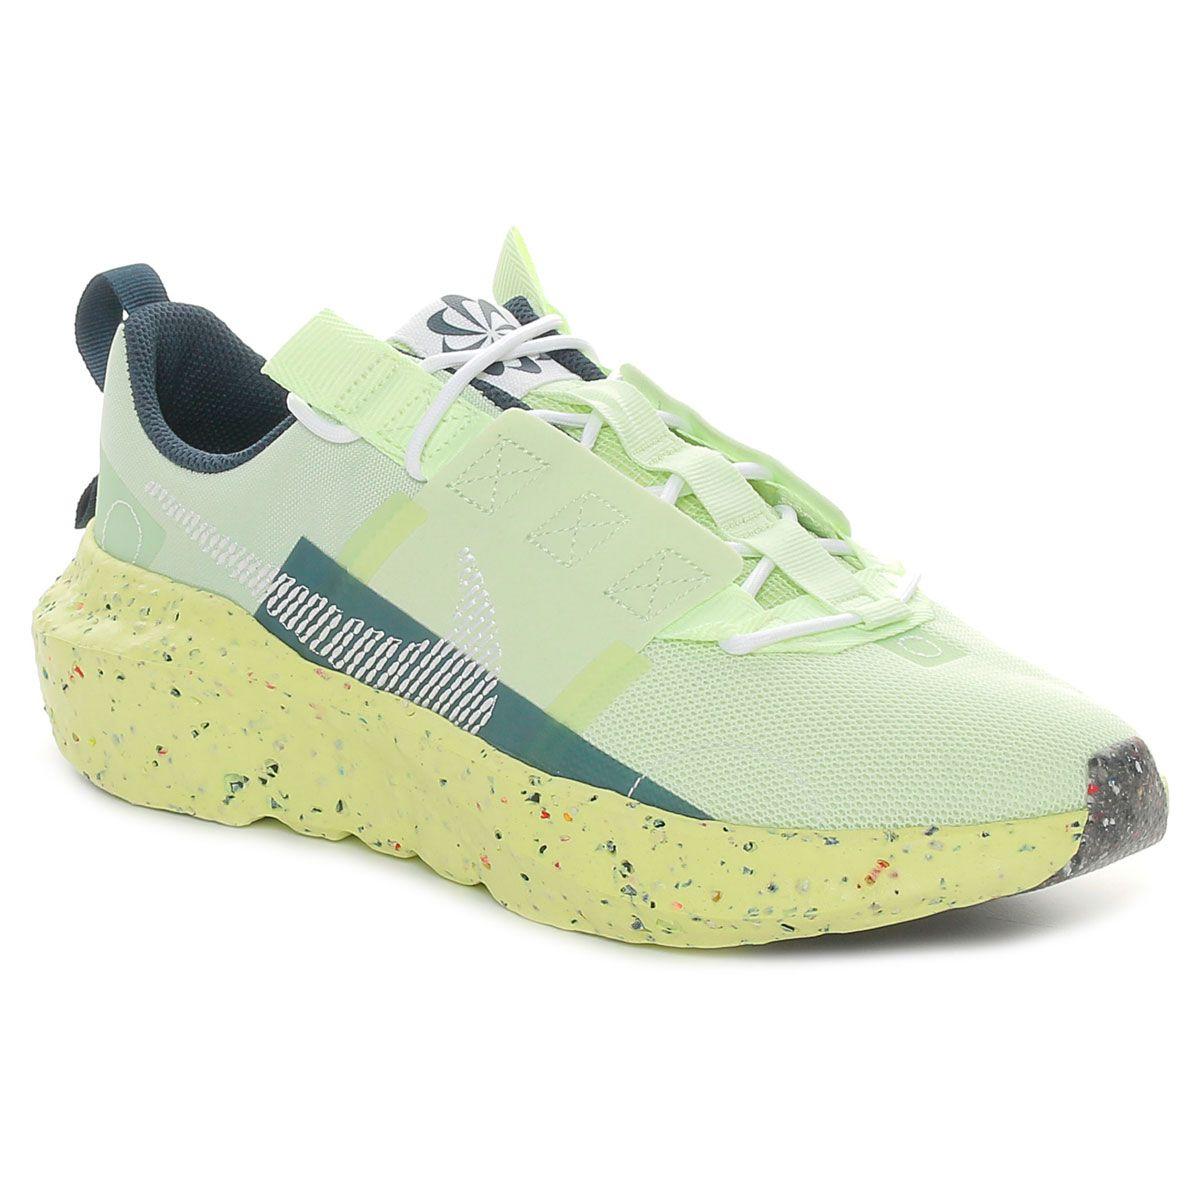 Nike Crater Impact Uomo Lime Verde